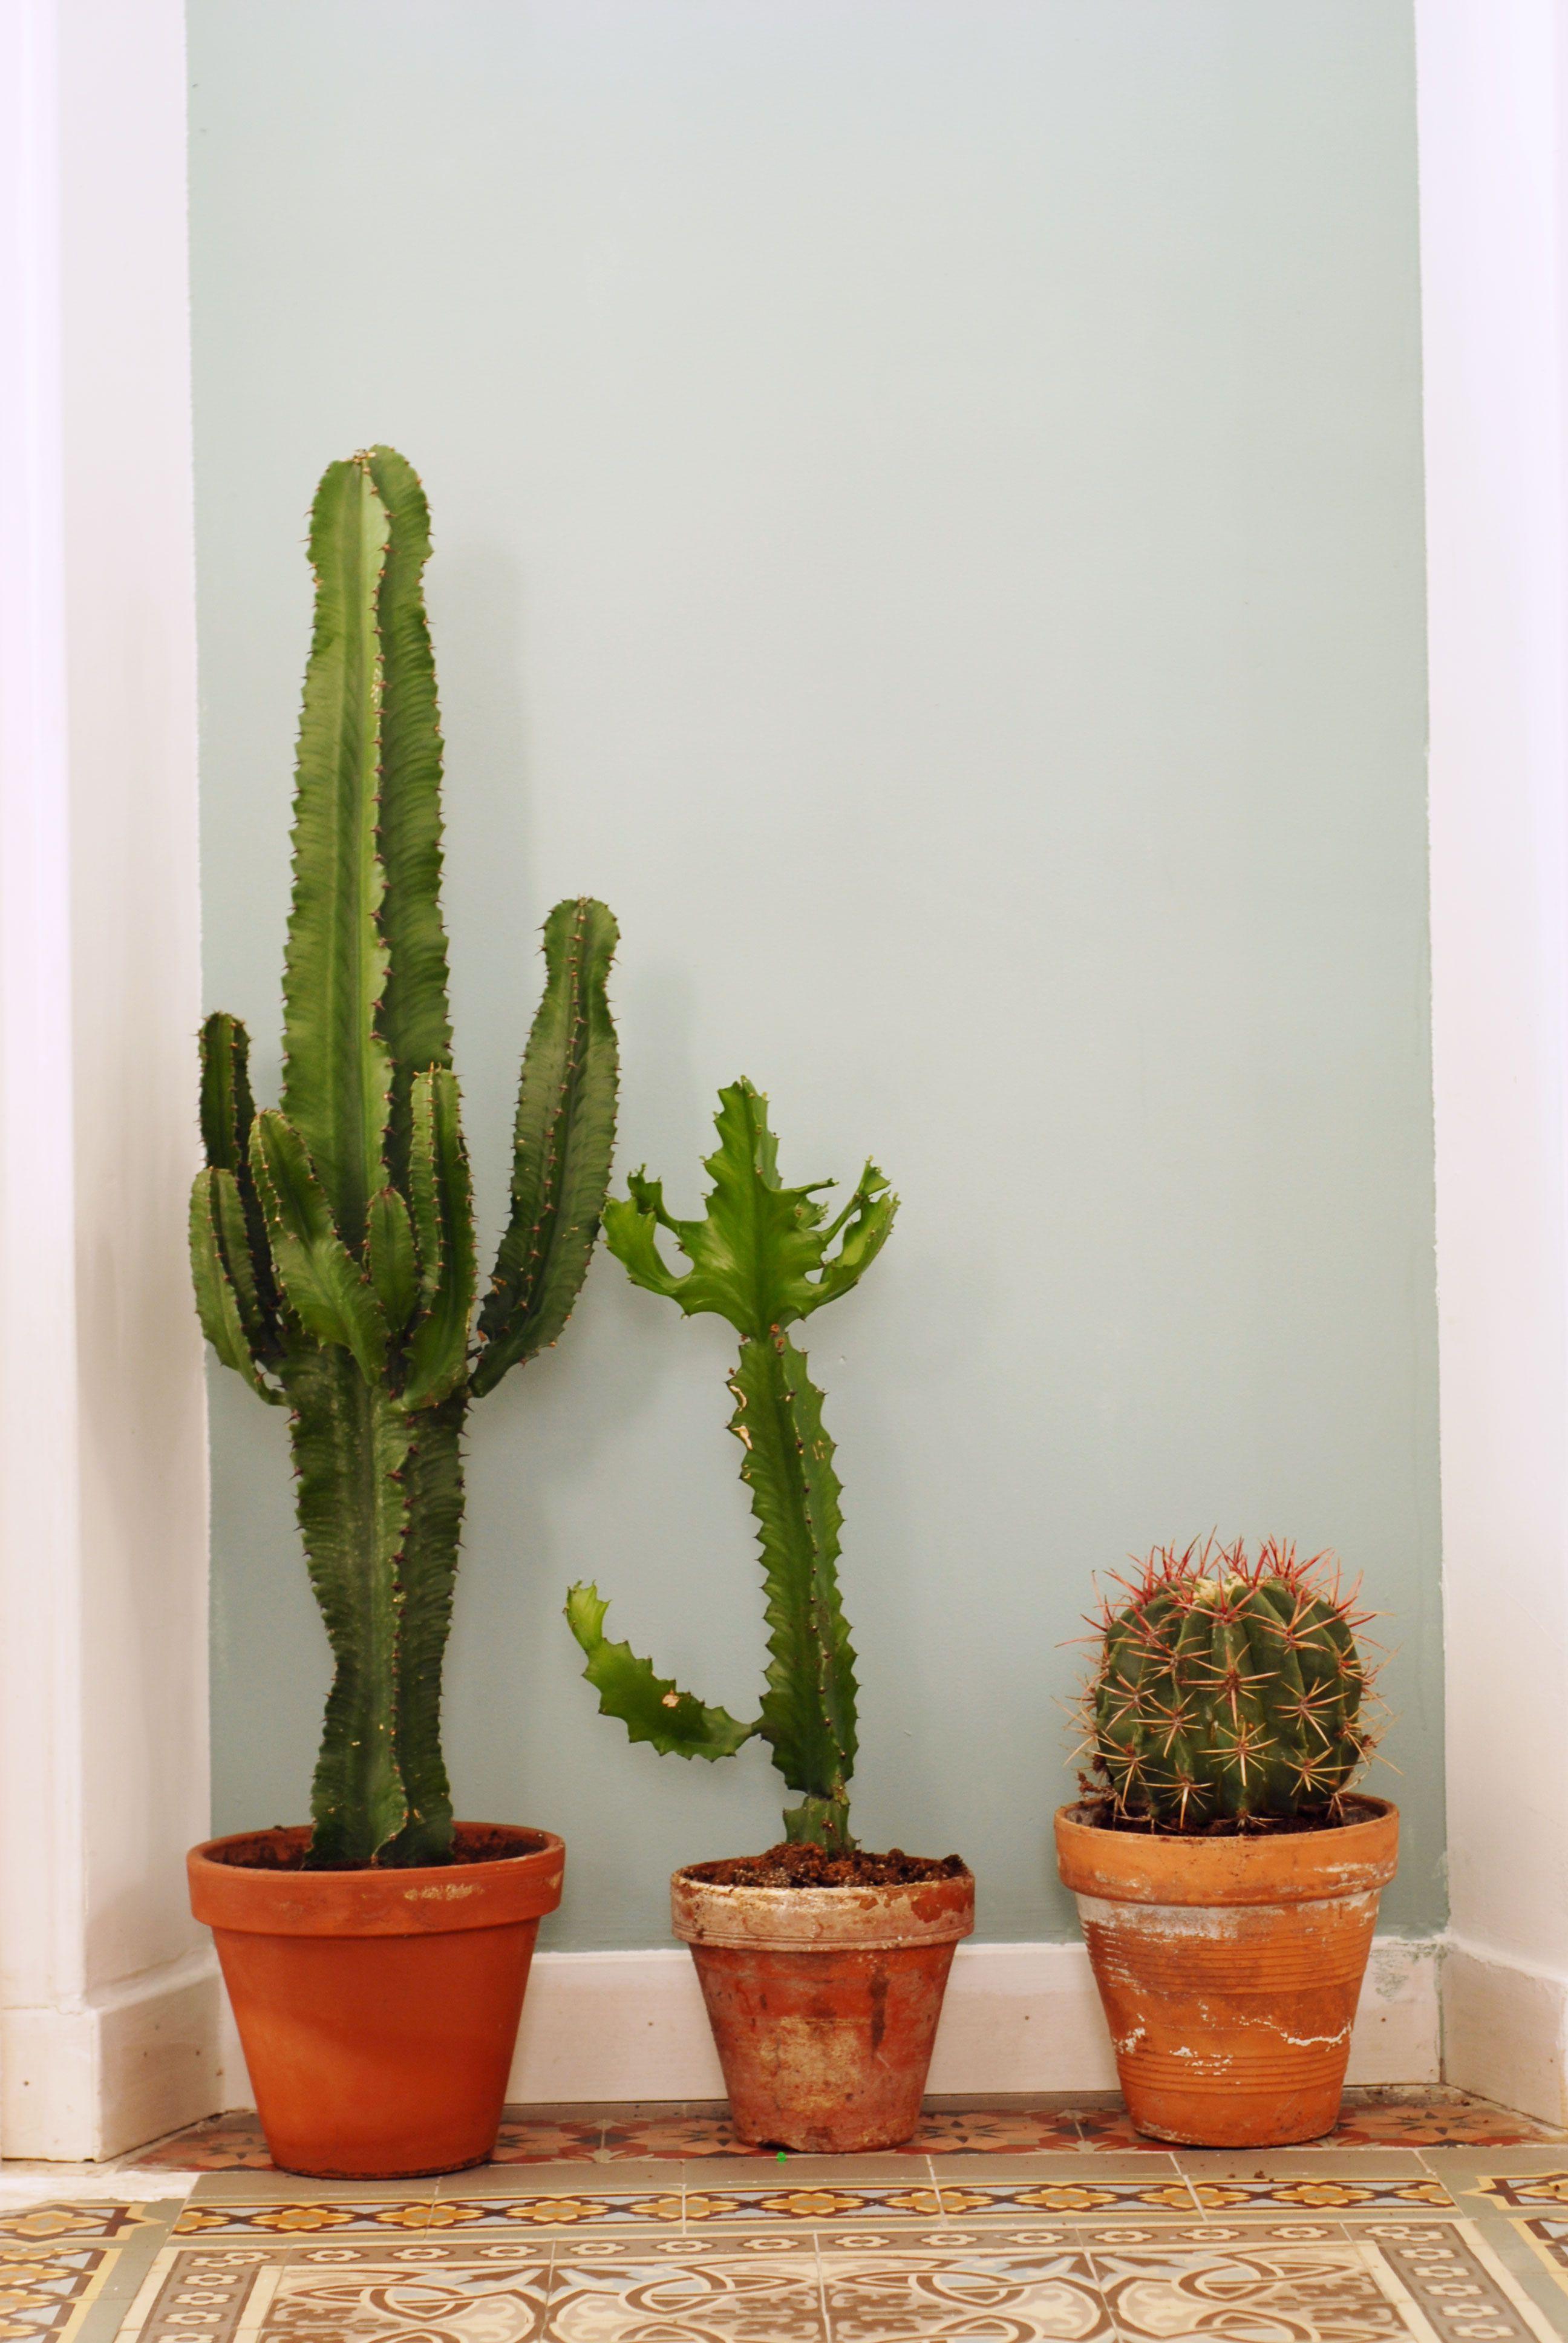 Pin By Kathryn Howard On Nature Lover Cactus Cactus Jardin Jardins